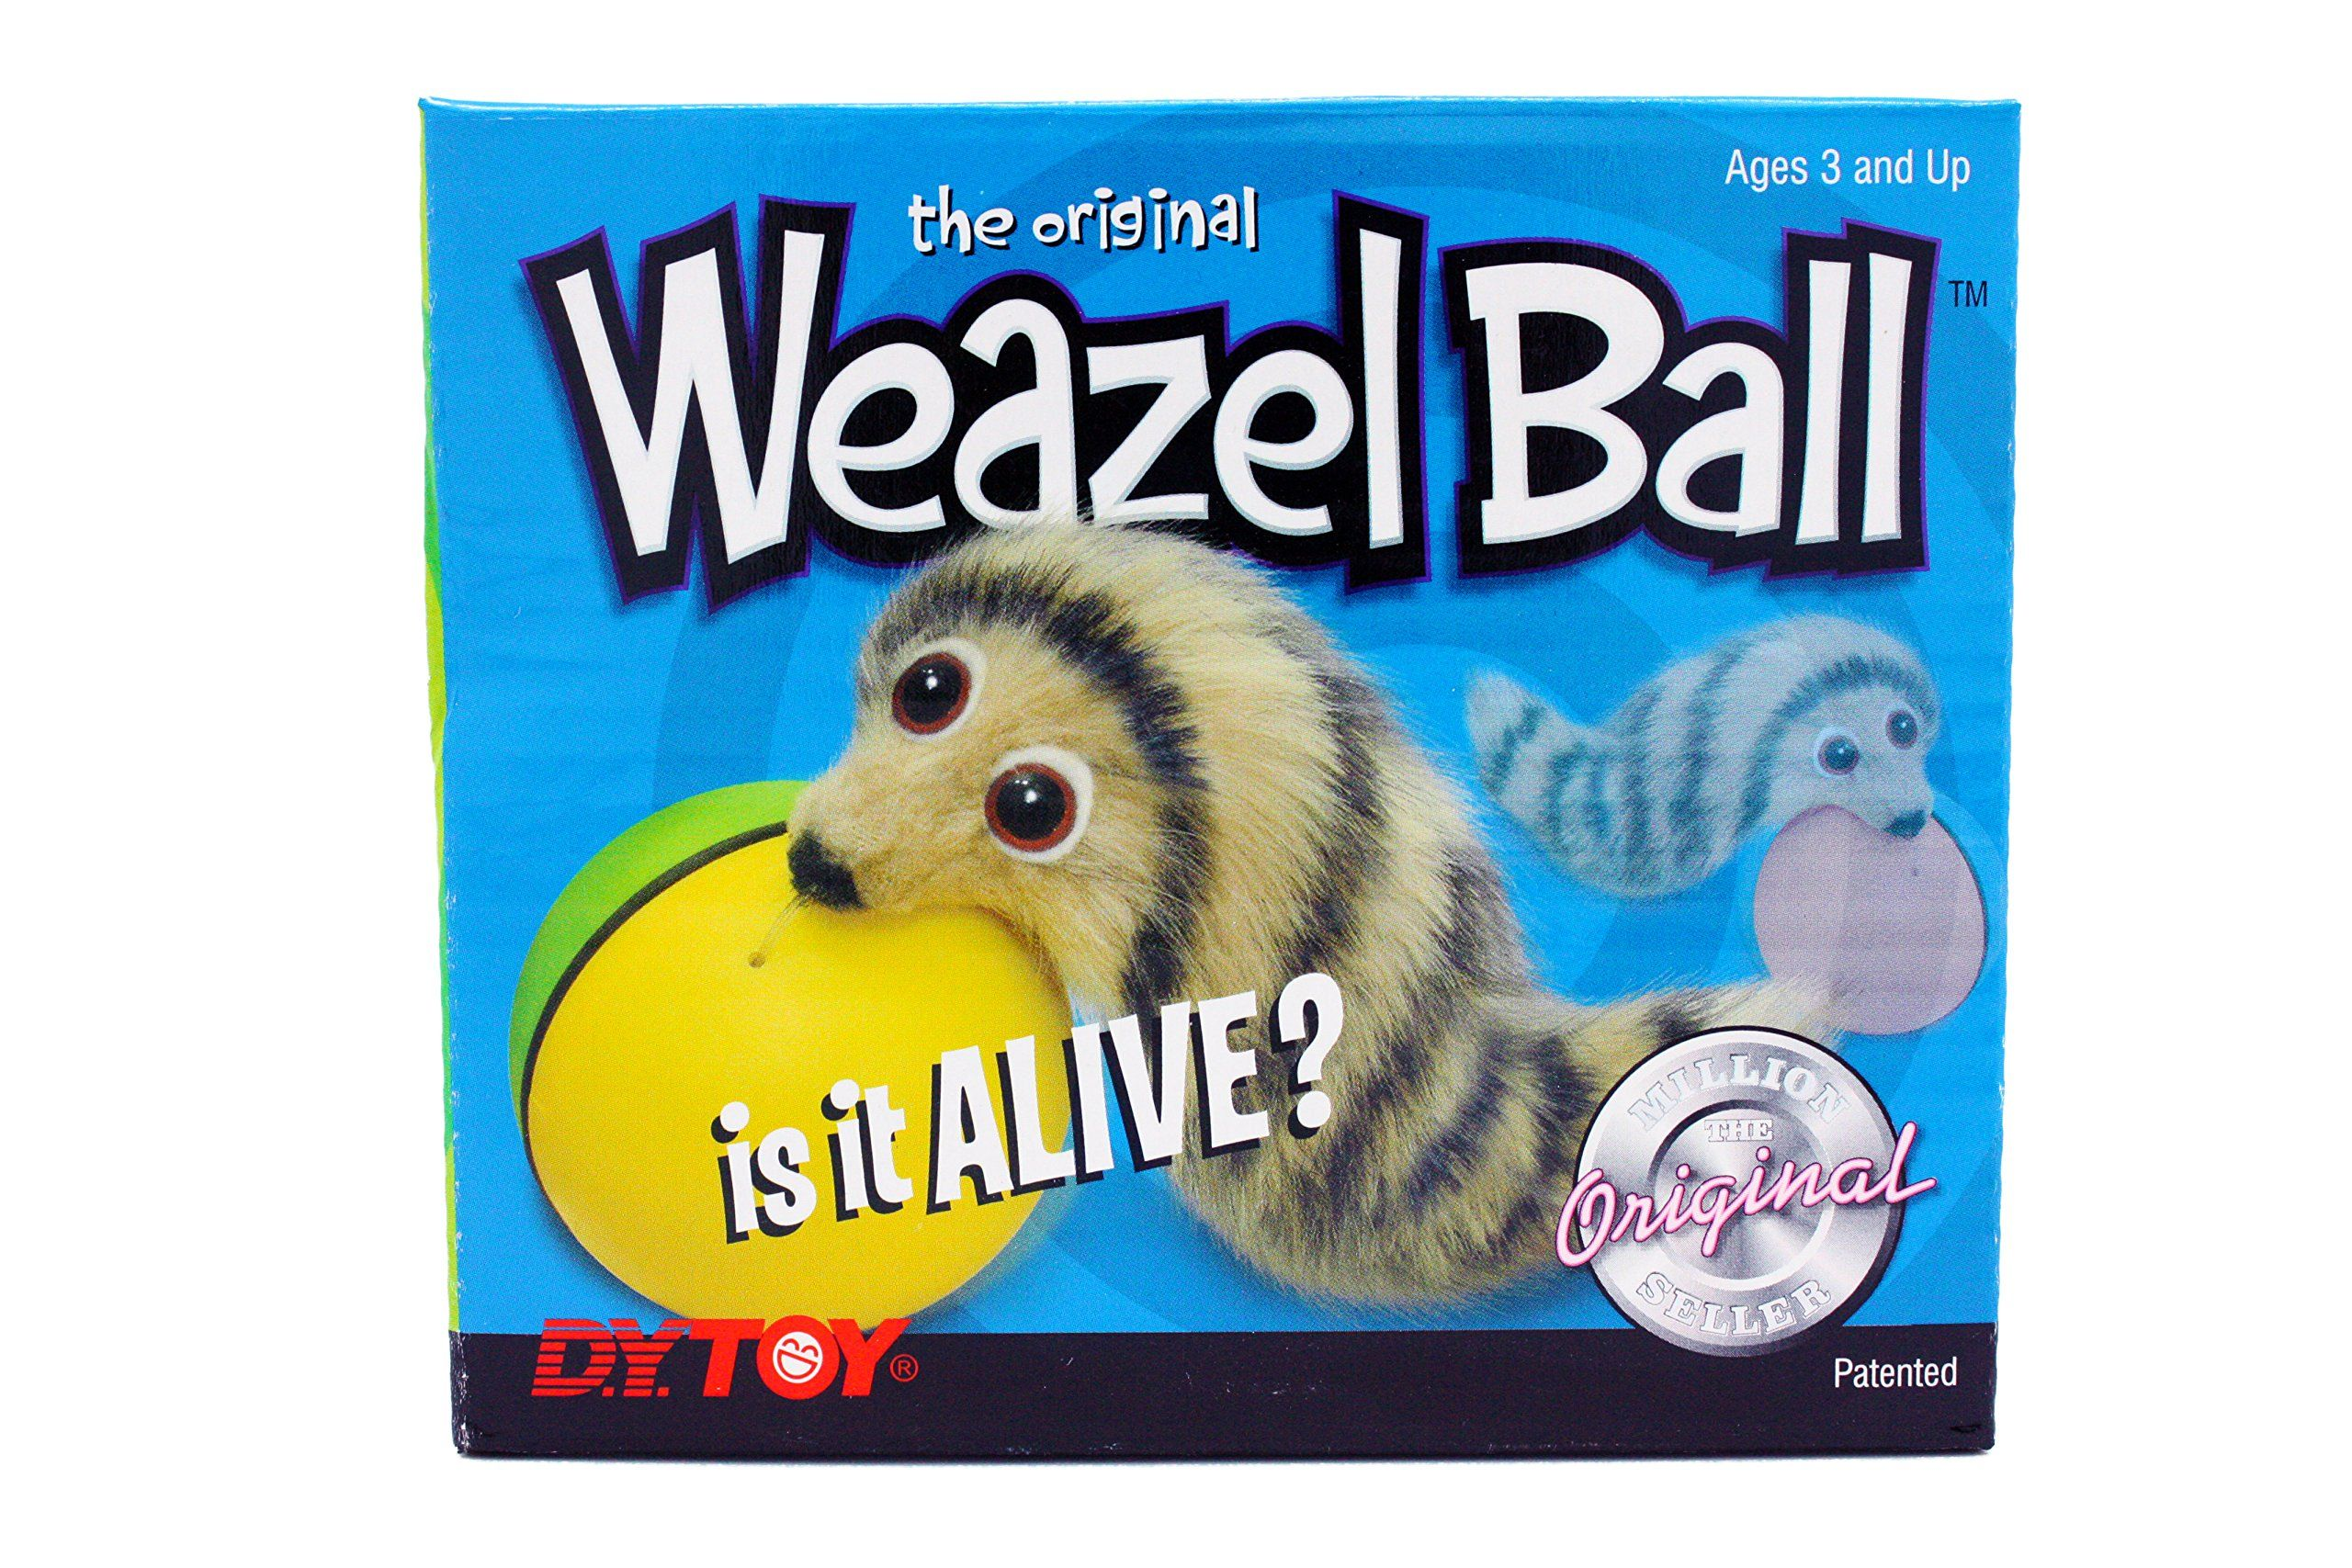 The Weasel Rolls with Ball Weazel Ball